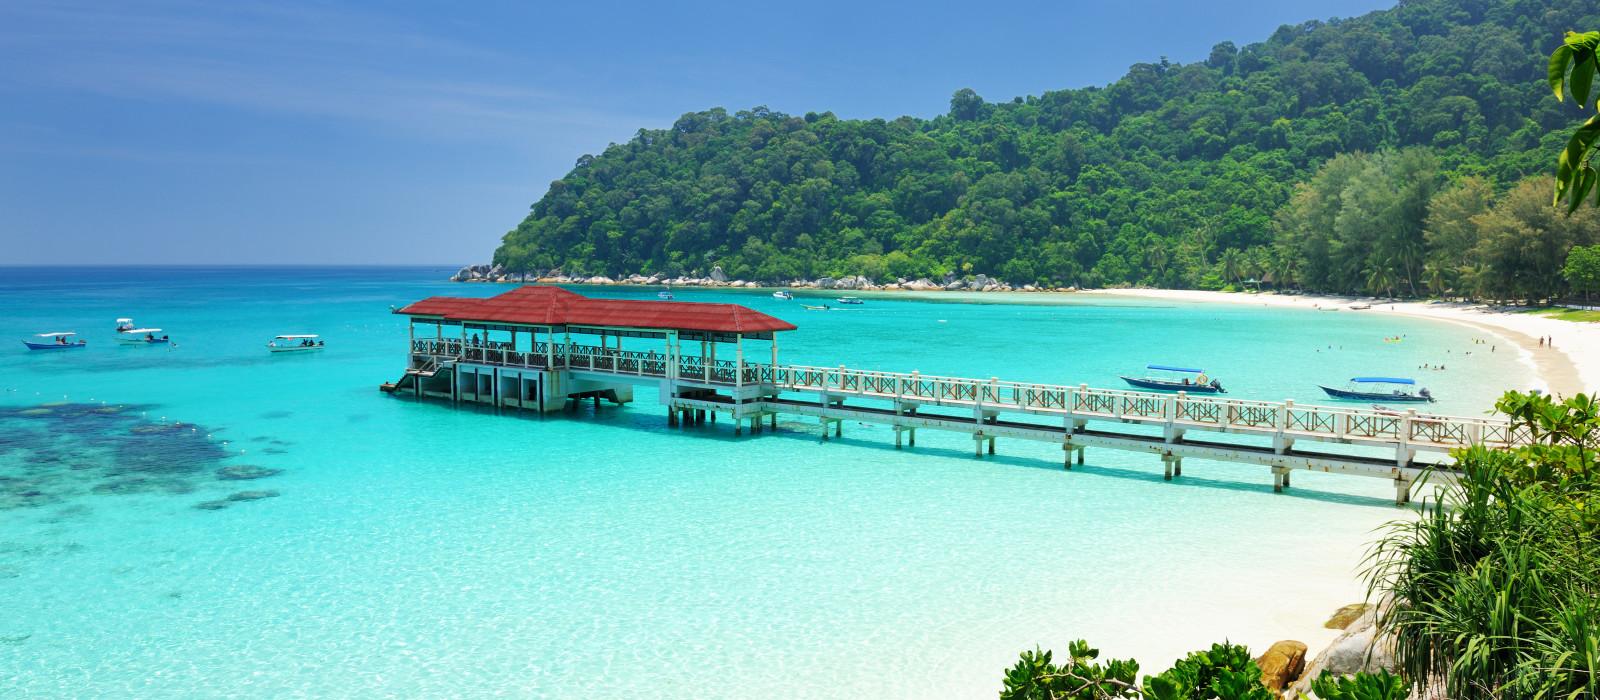 Reiseziel Perhentian Inseln Malaysia